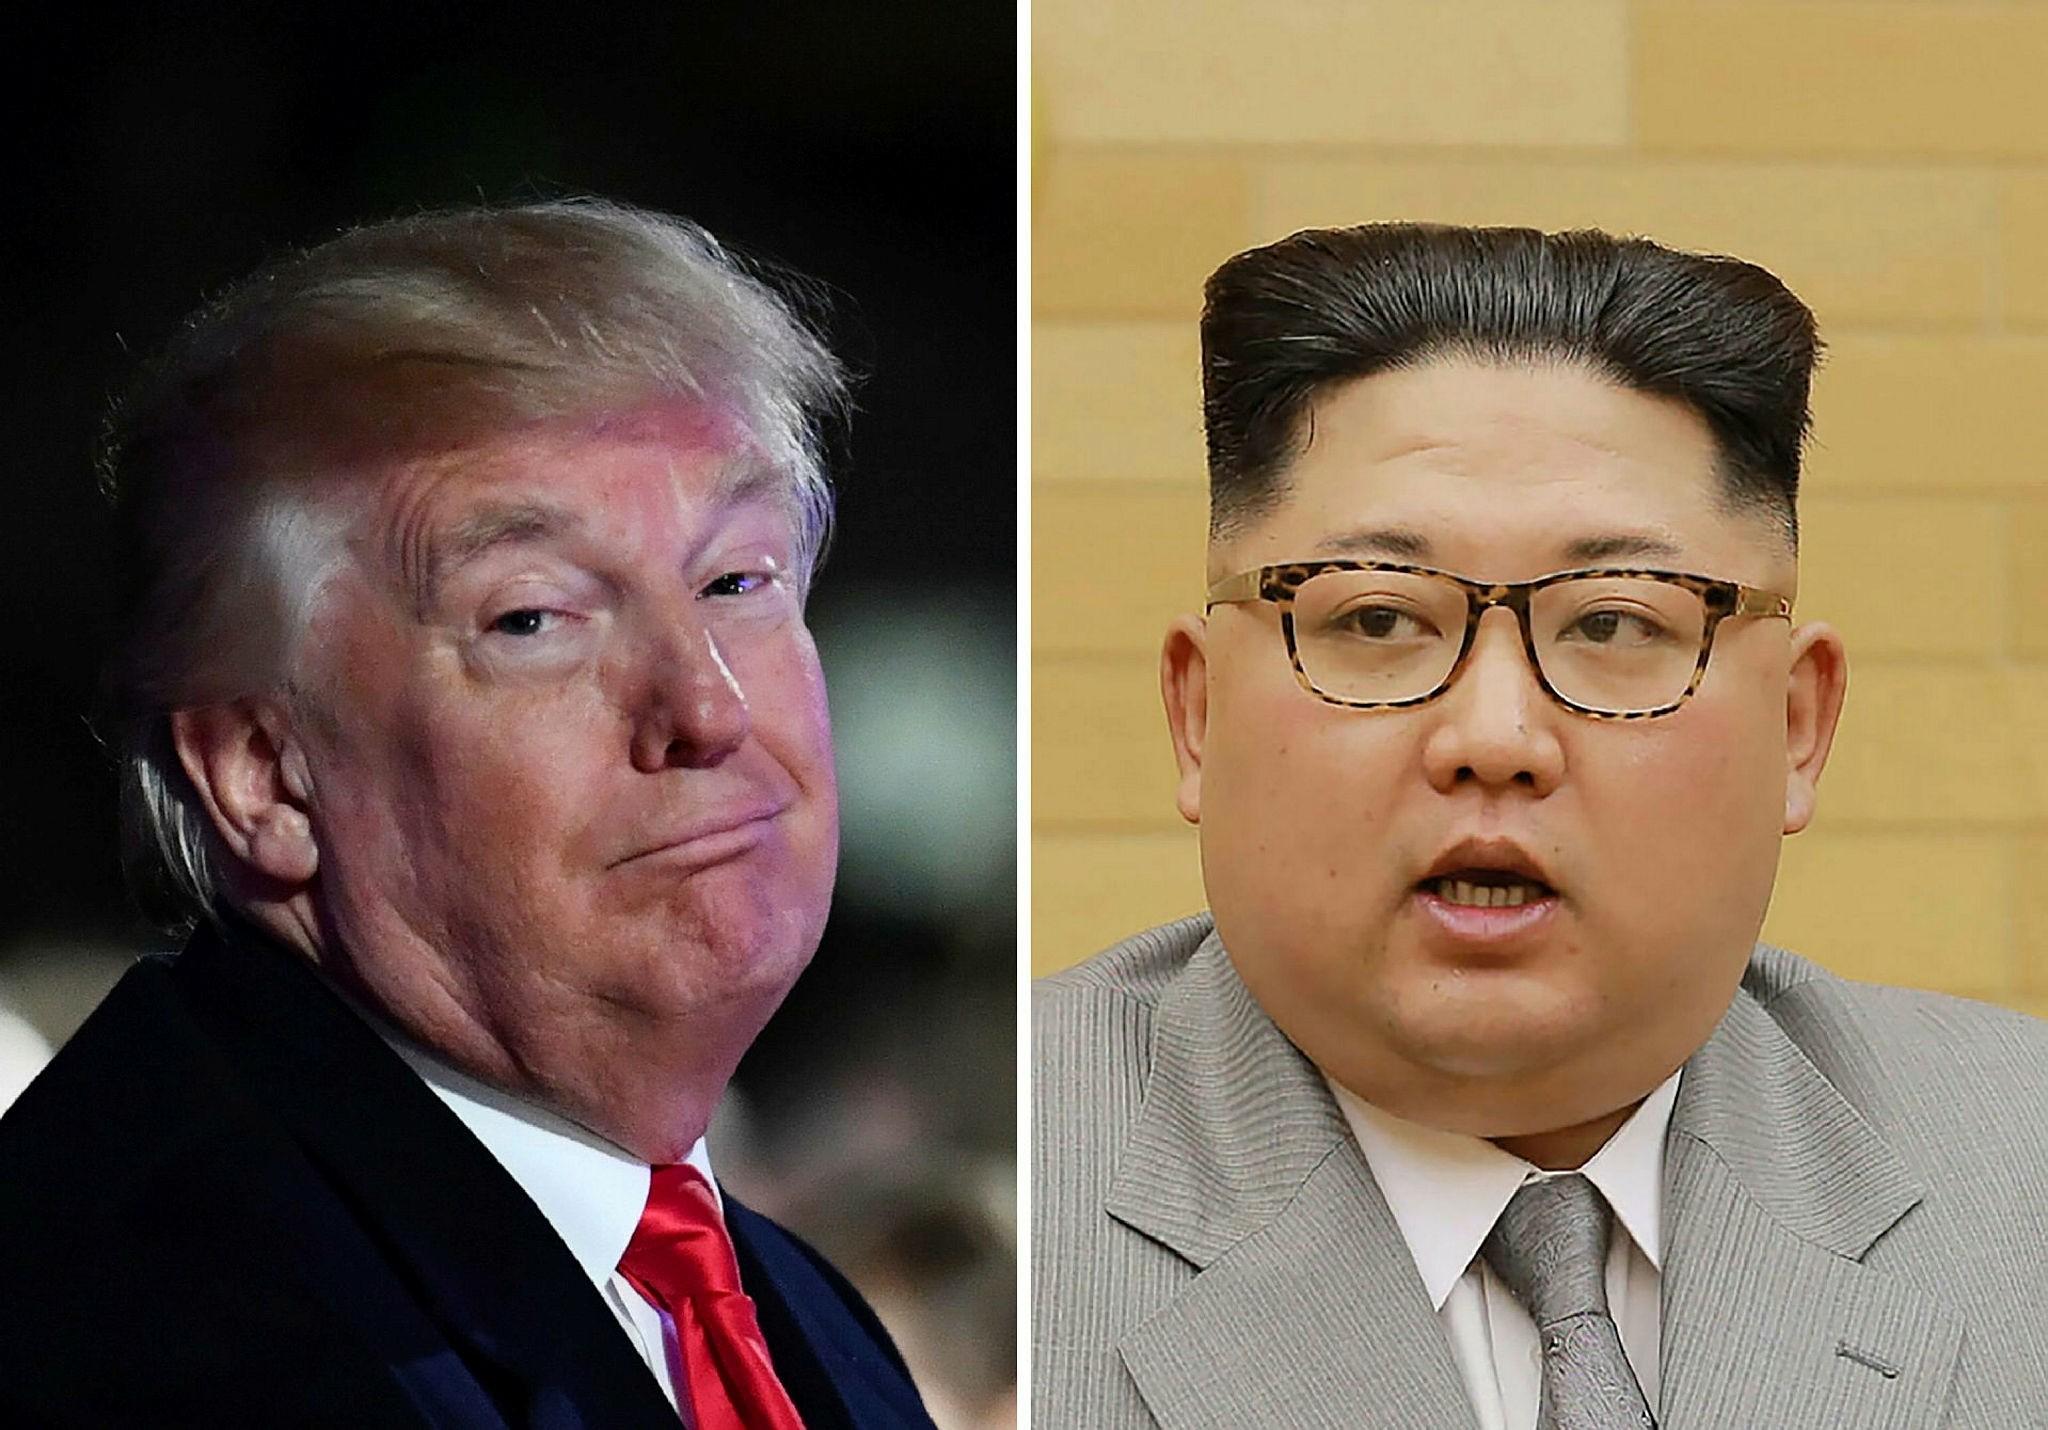 Trump (L) and North Korean Supreme Leader Kim Jong Un